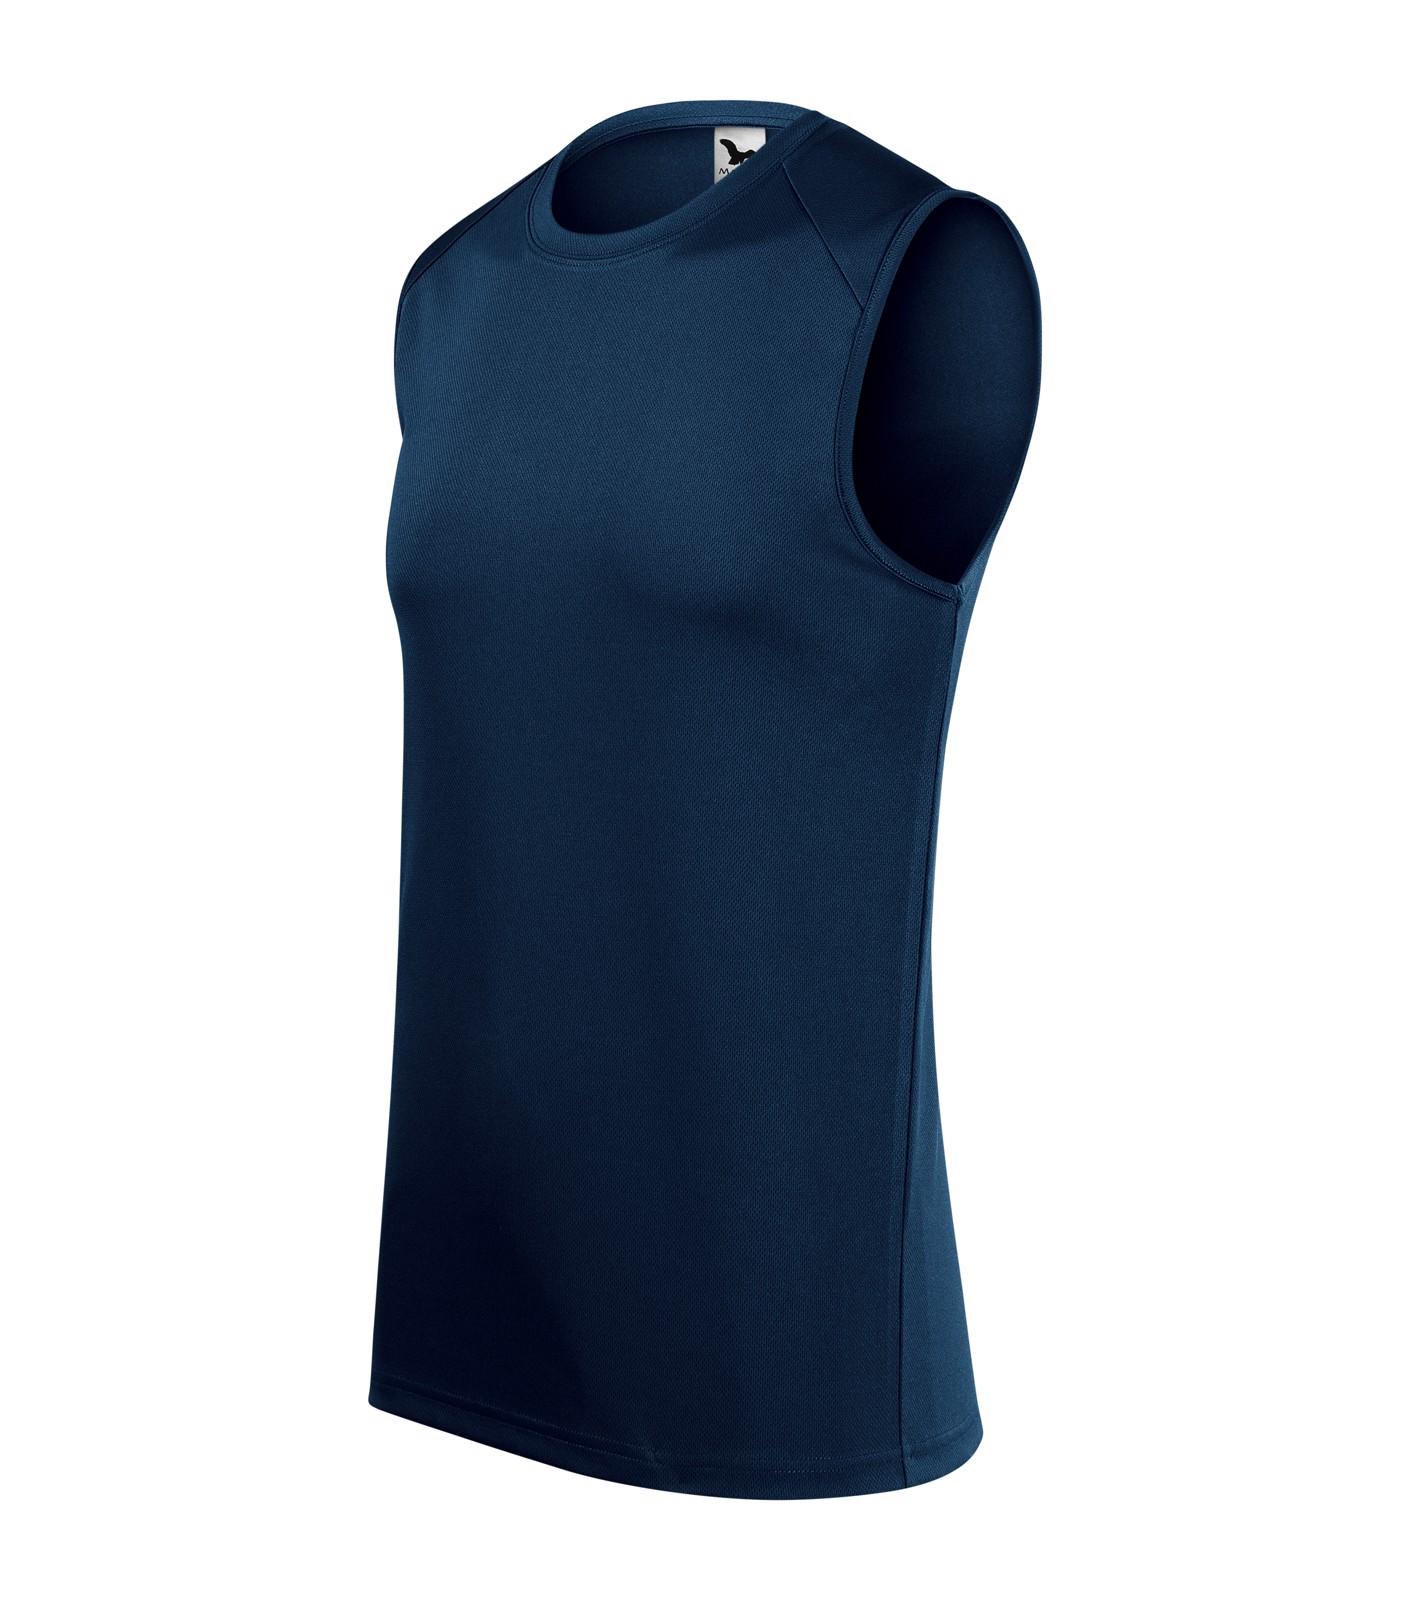 Tílko pánské Malfini Breeze - Námořní Modrá / XL